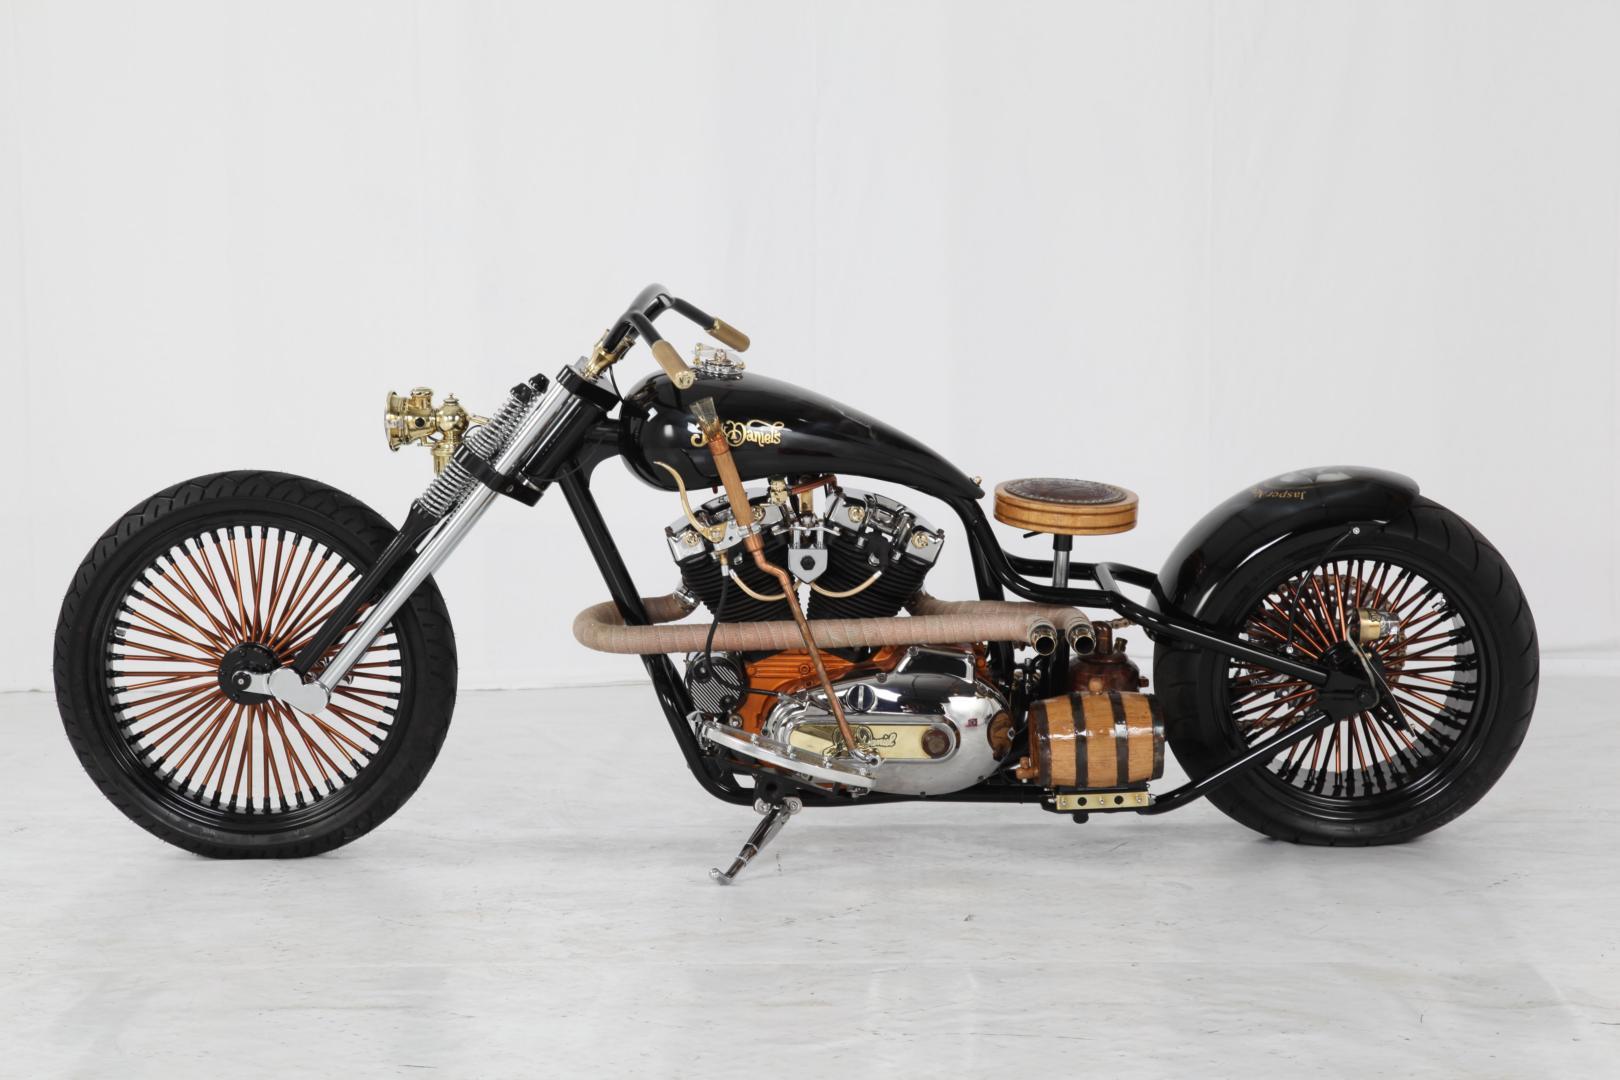 hoosier-daddy-choppers-jack-daniel-s-custom-harley-davidson-photo-gallery-51481_1